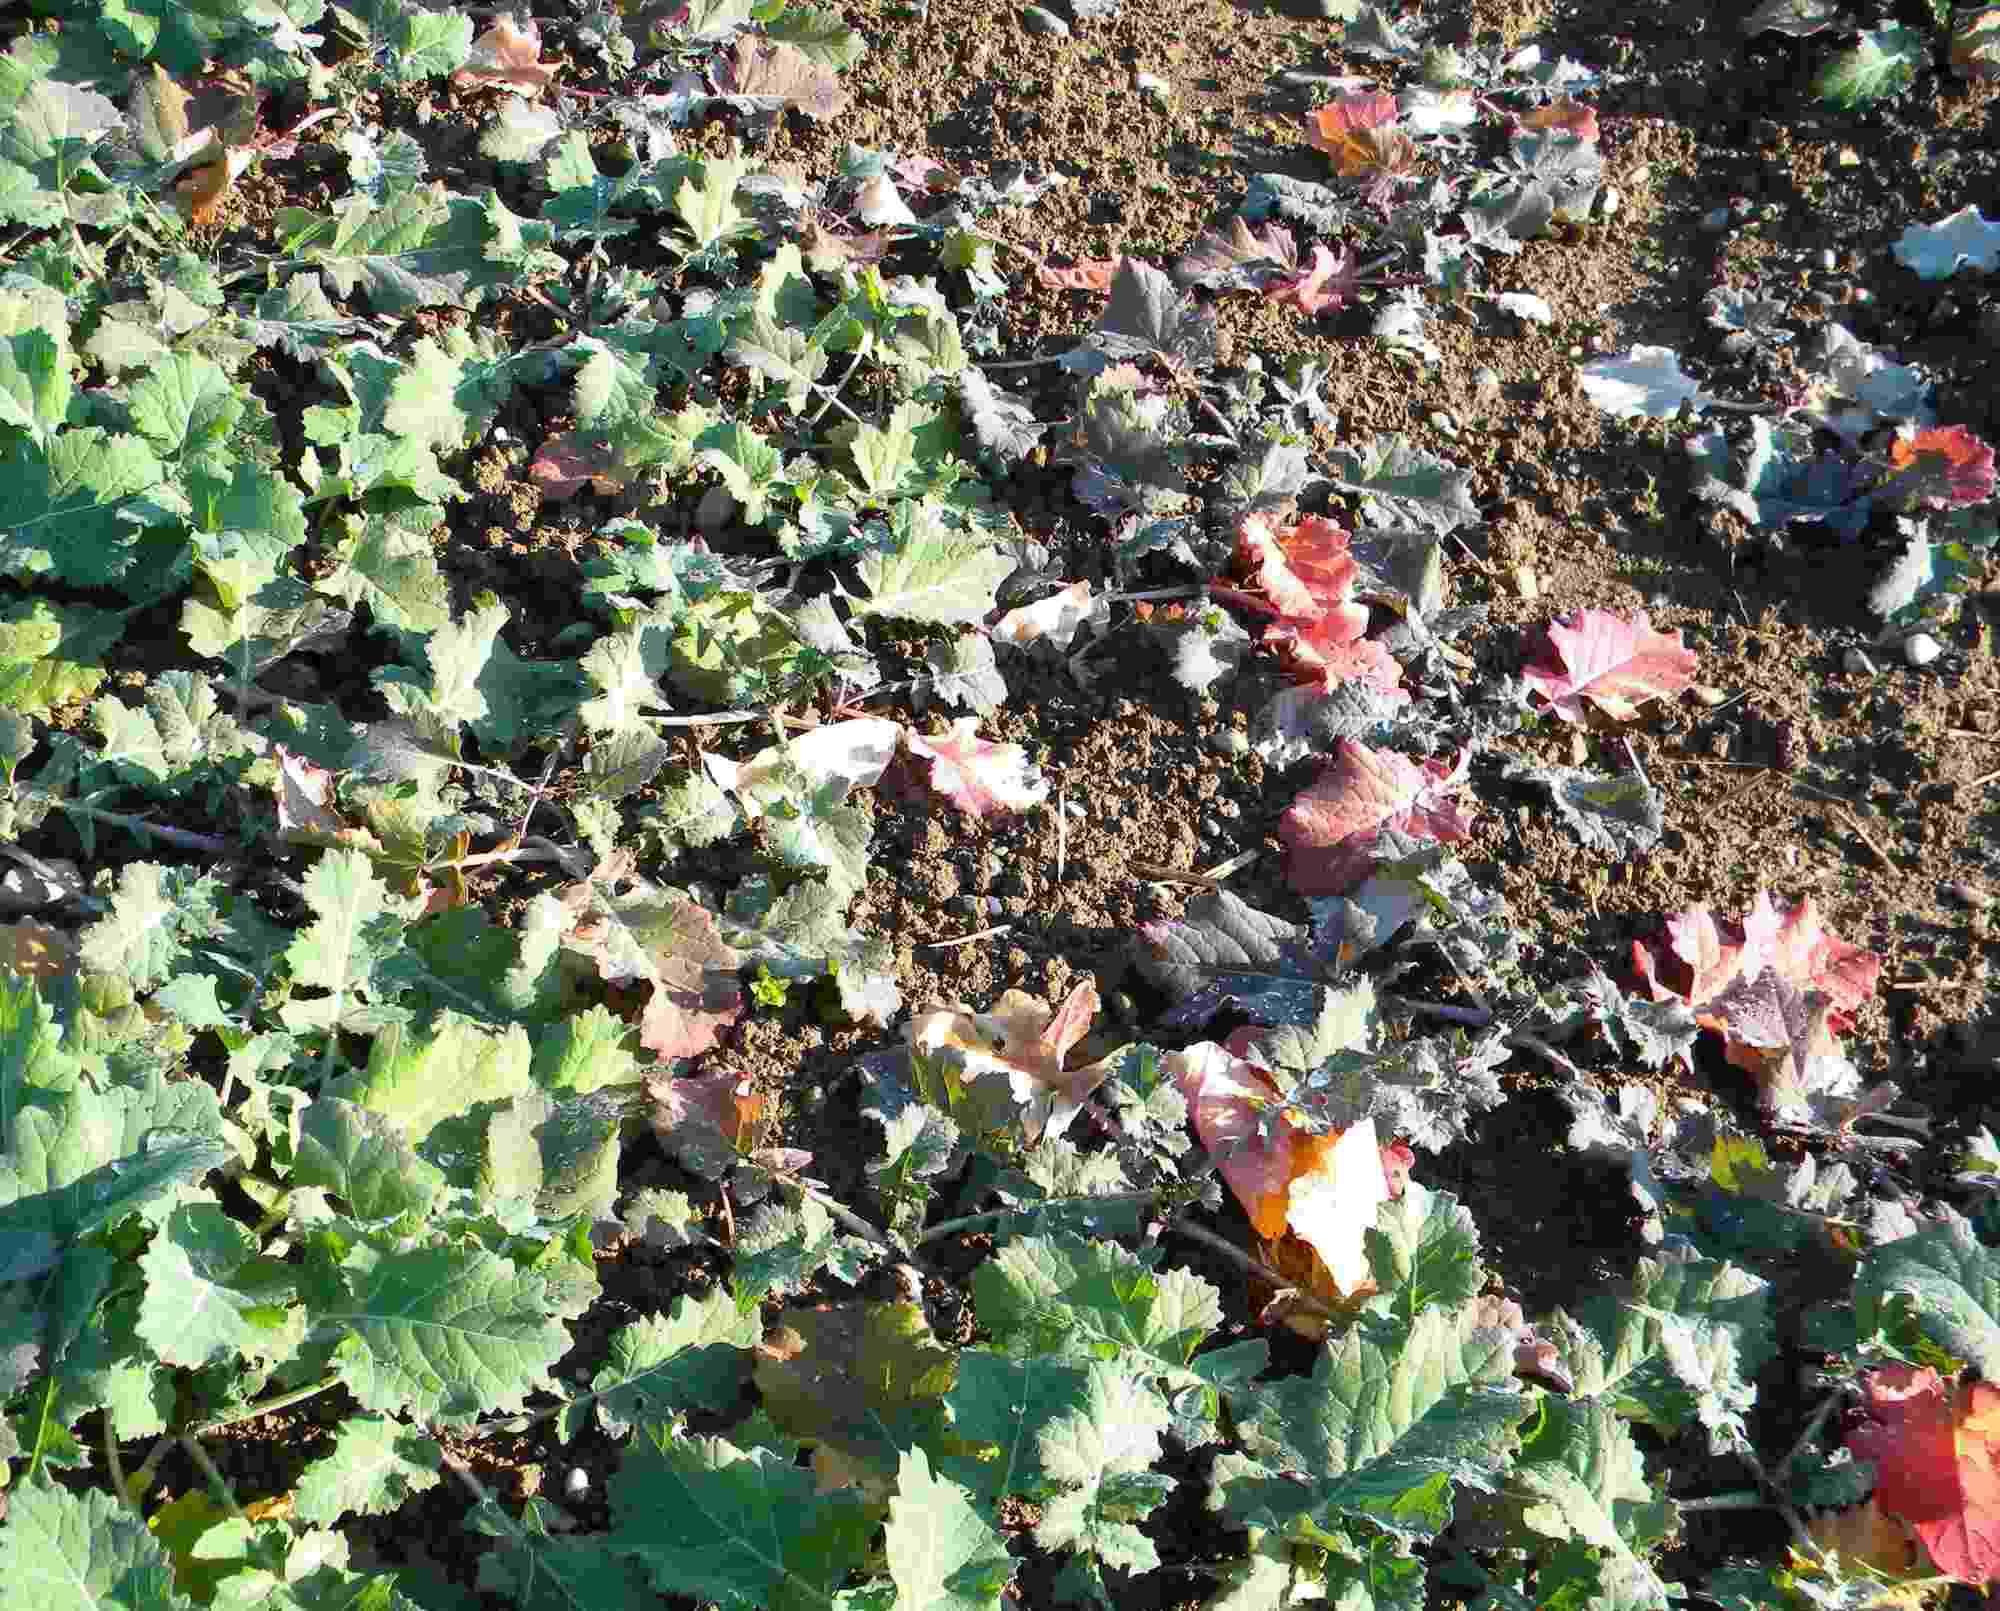 Pflanzenschutz aktuell Raps Wasserrübenvergilbungsvirus